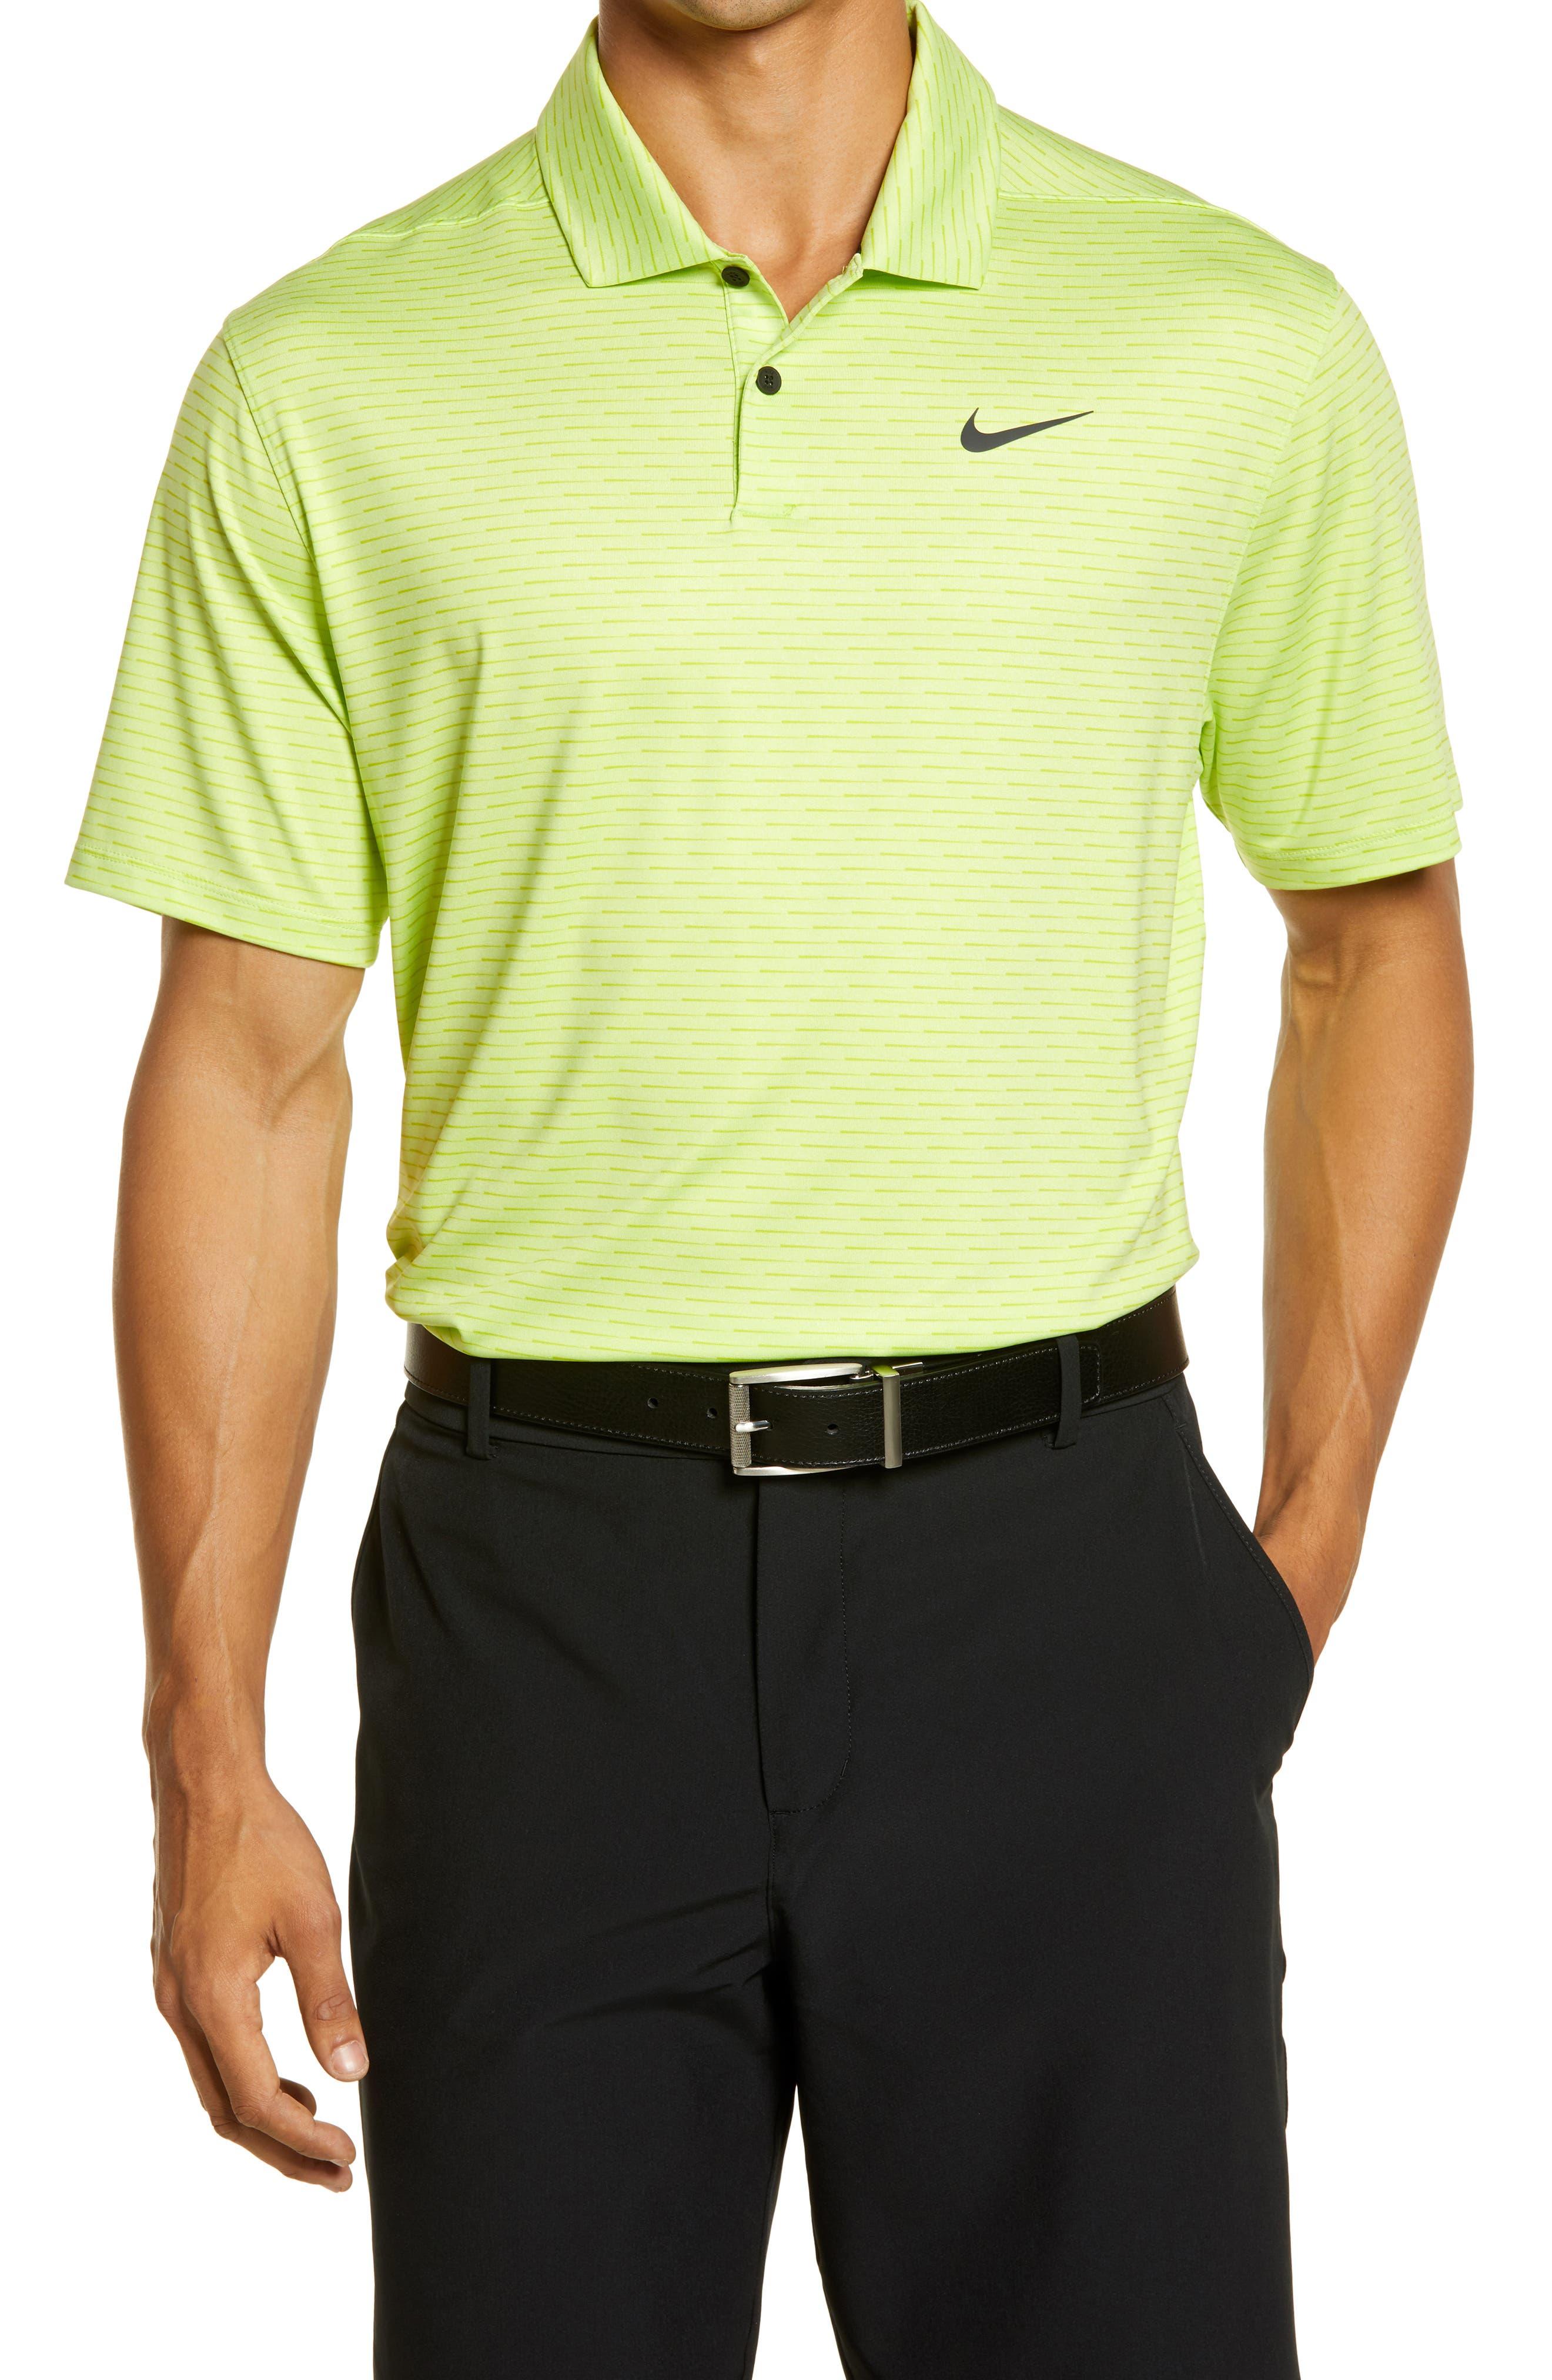 Men's Spandex Polo Shirts | Nordstrom